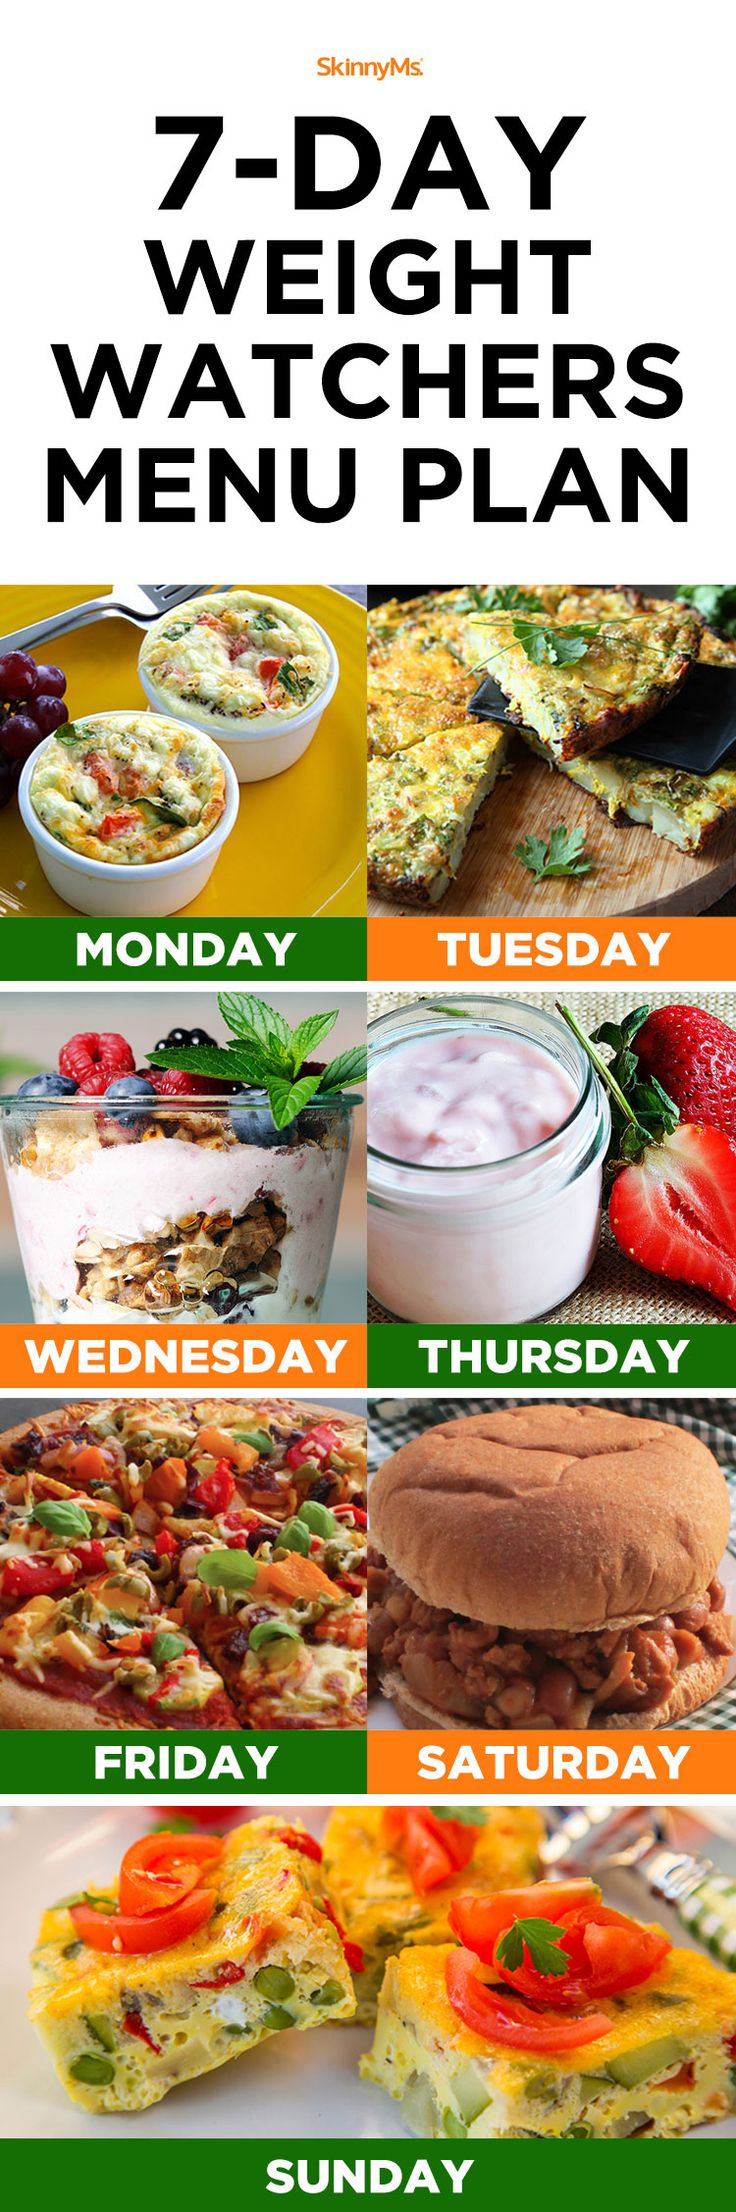 7 Day Weight Watchers Menu Plan!#weightwatchers#menu